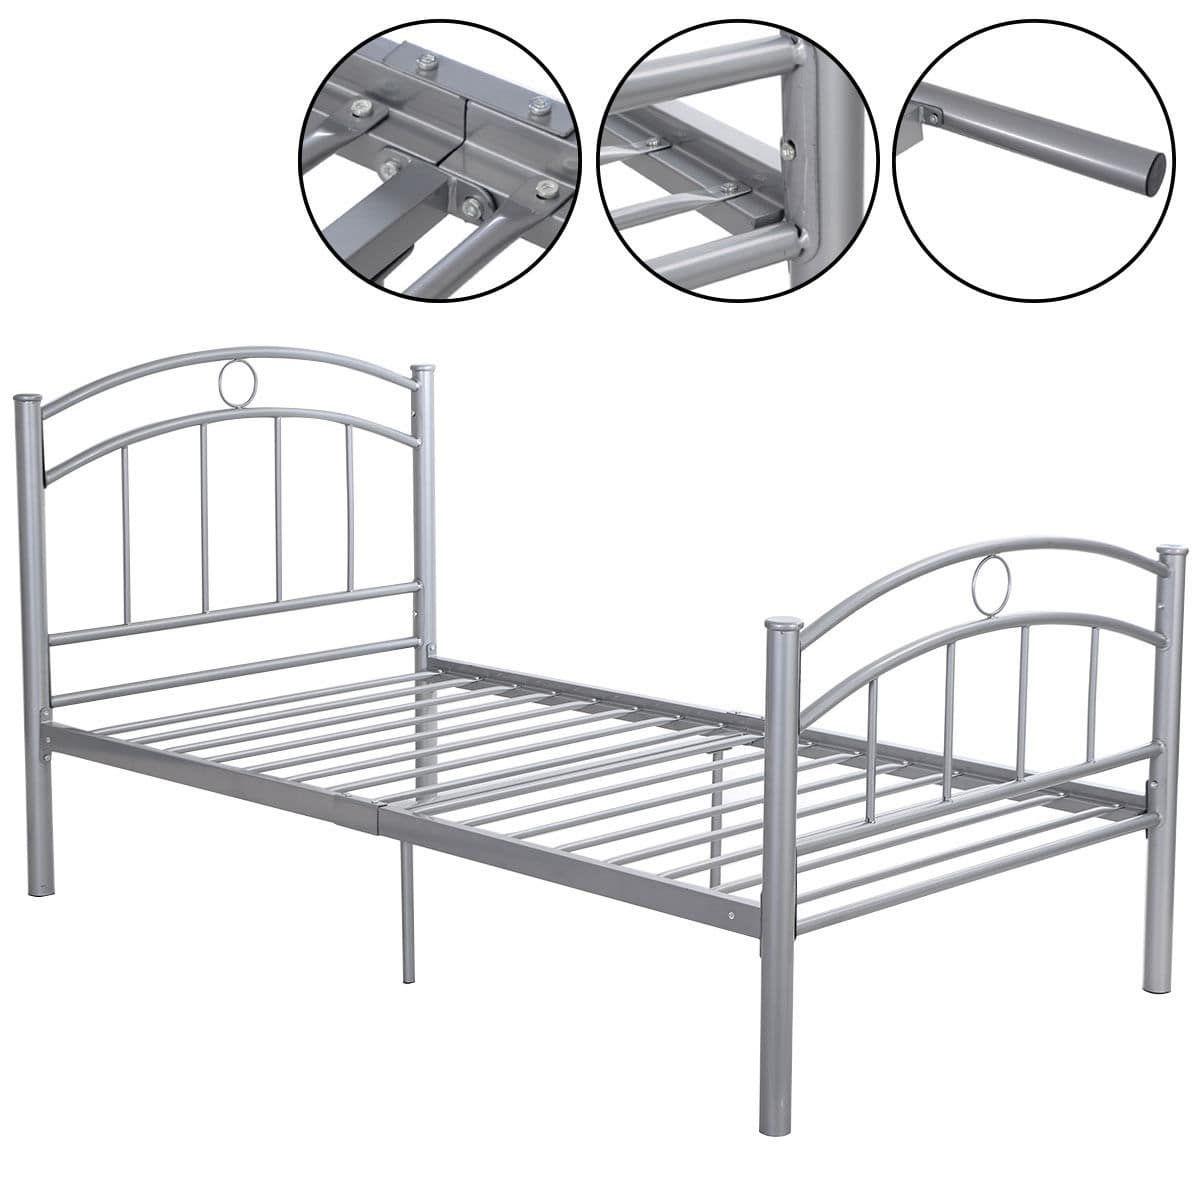 Costway 83\'\'x42\'\'x35\'\' Black Metal Bed Frame Platform Twin Size ...